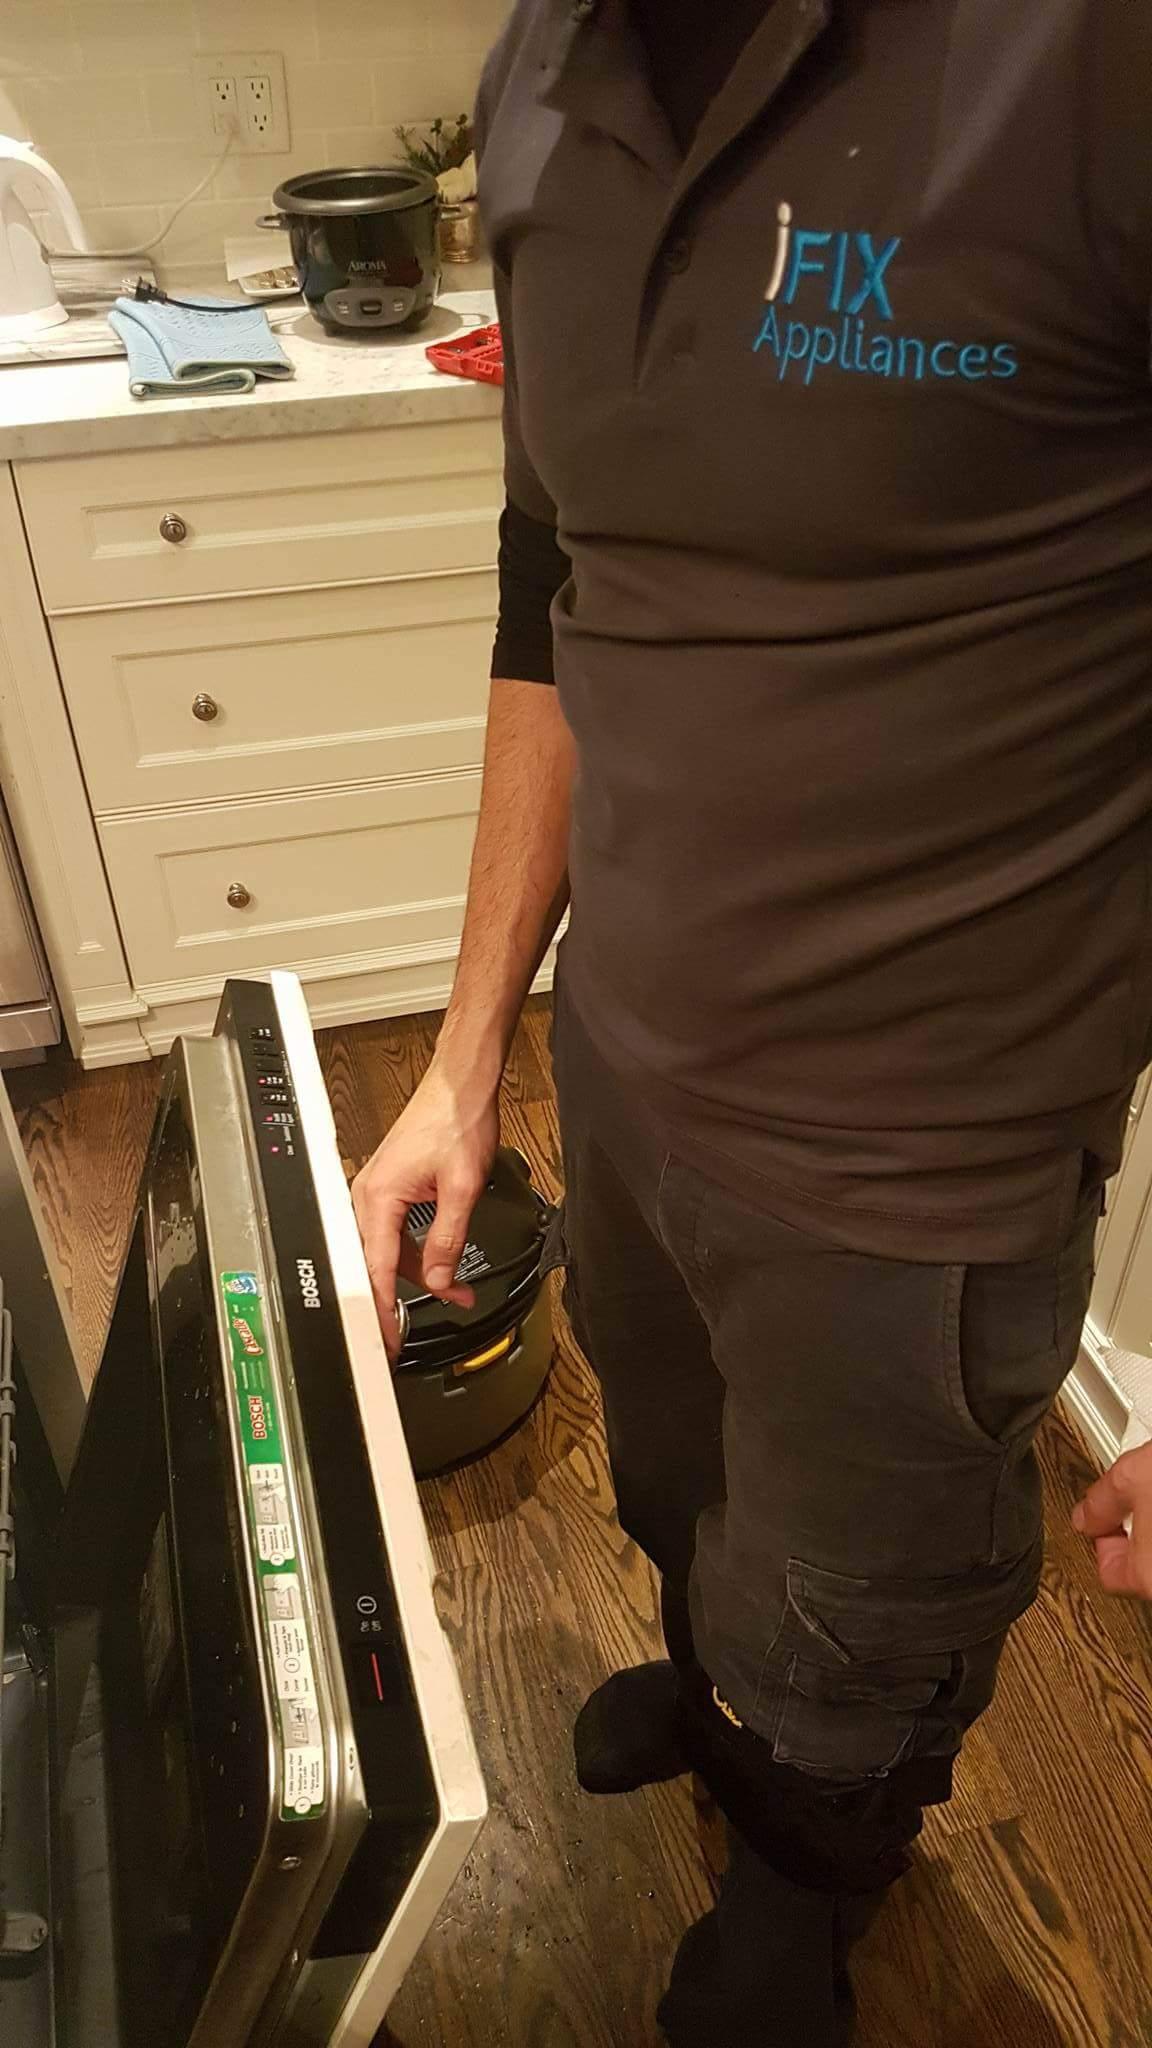 Range Stove Repair in Toronto and GTA by I-Fix Appliance Repair